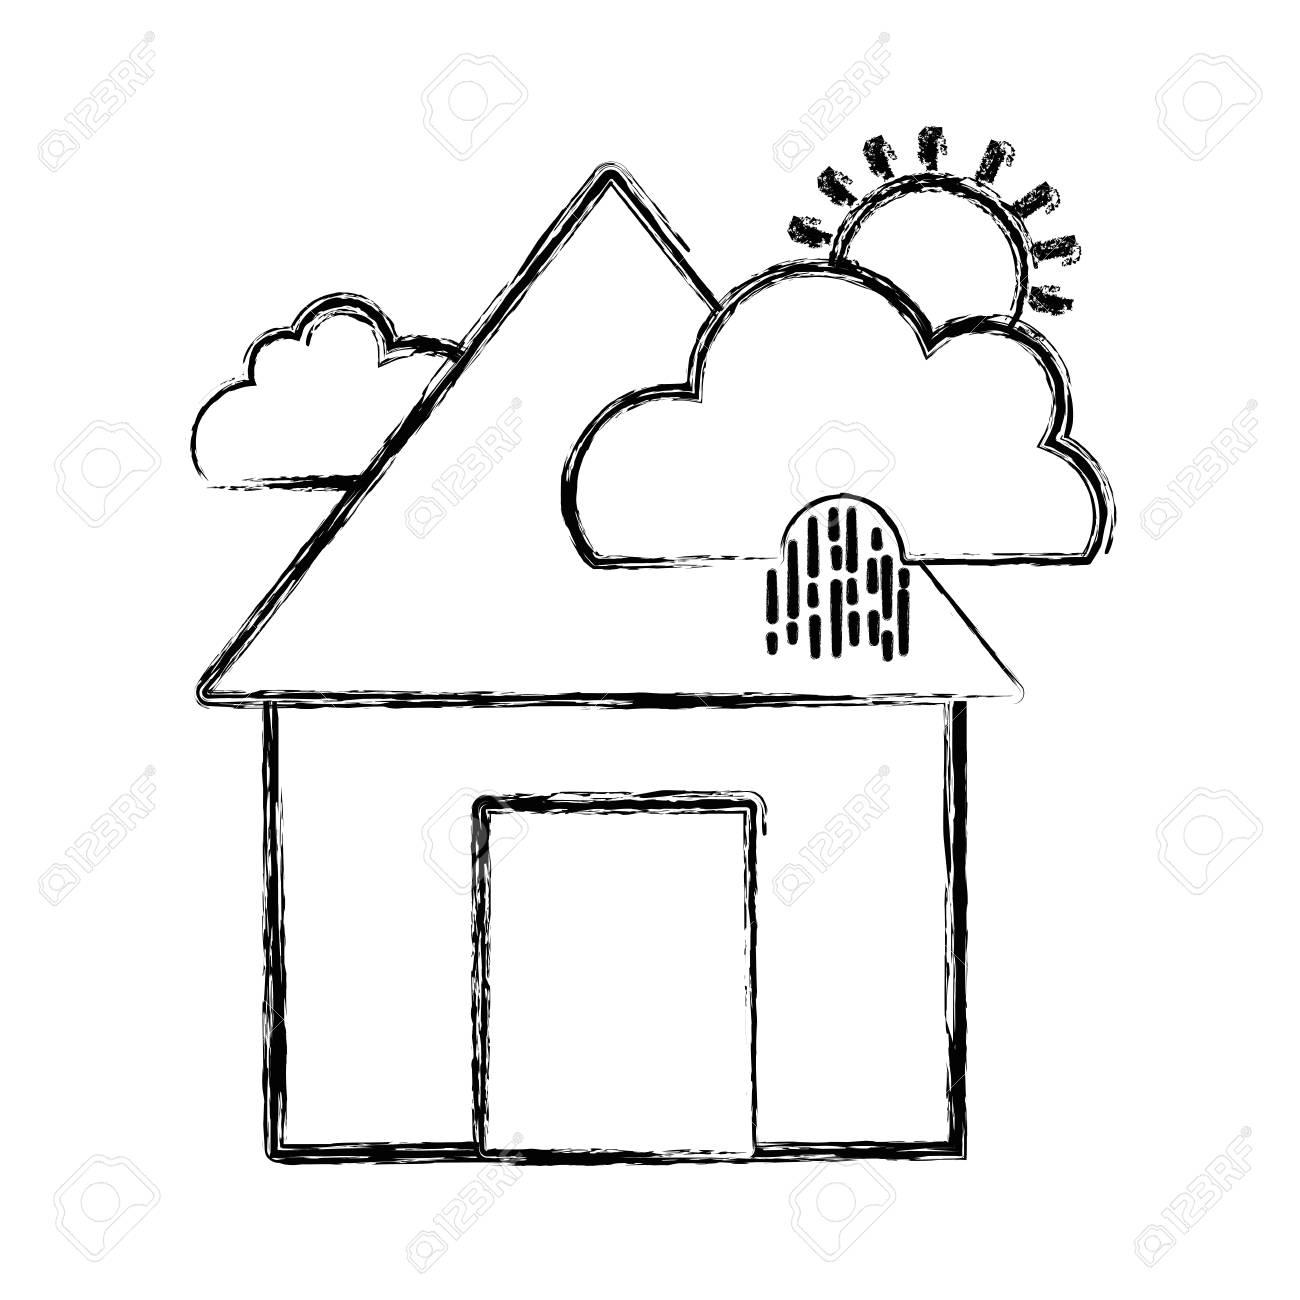 House in Clouds Clip Art